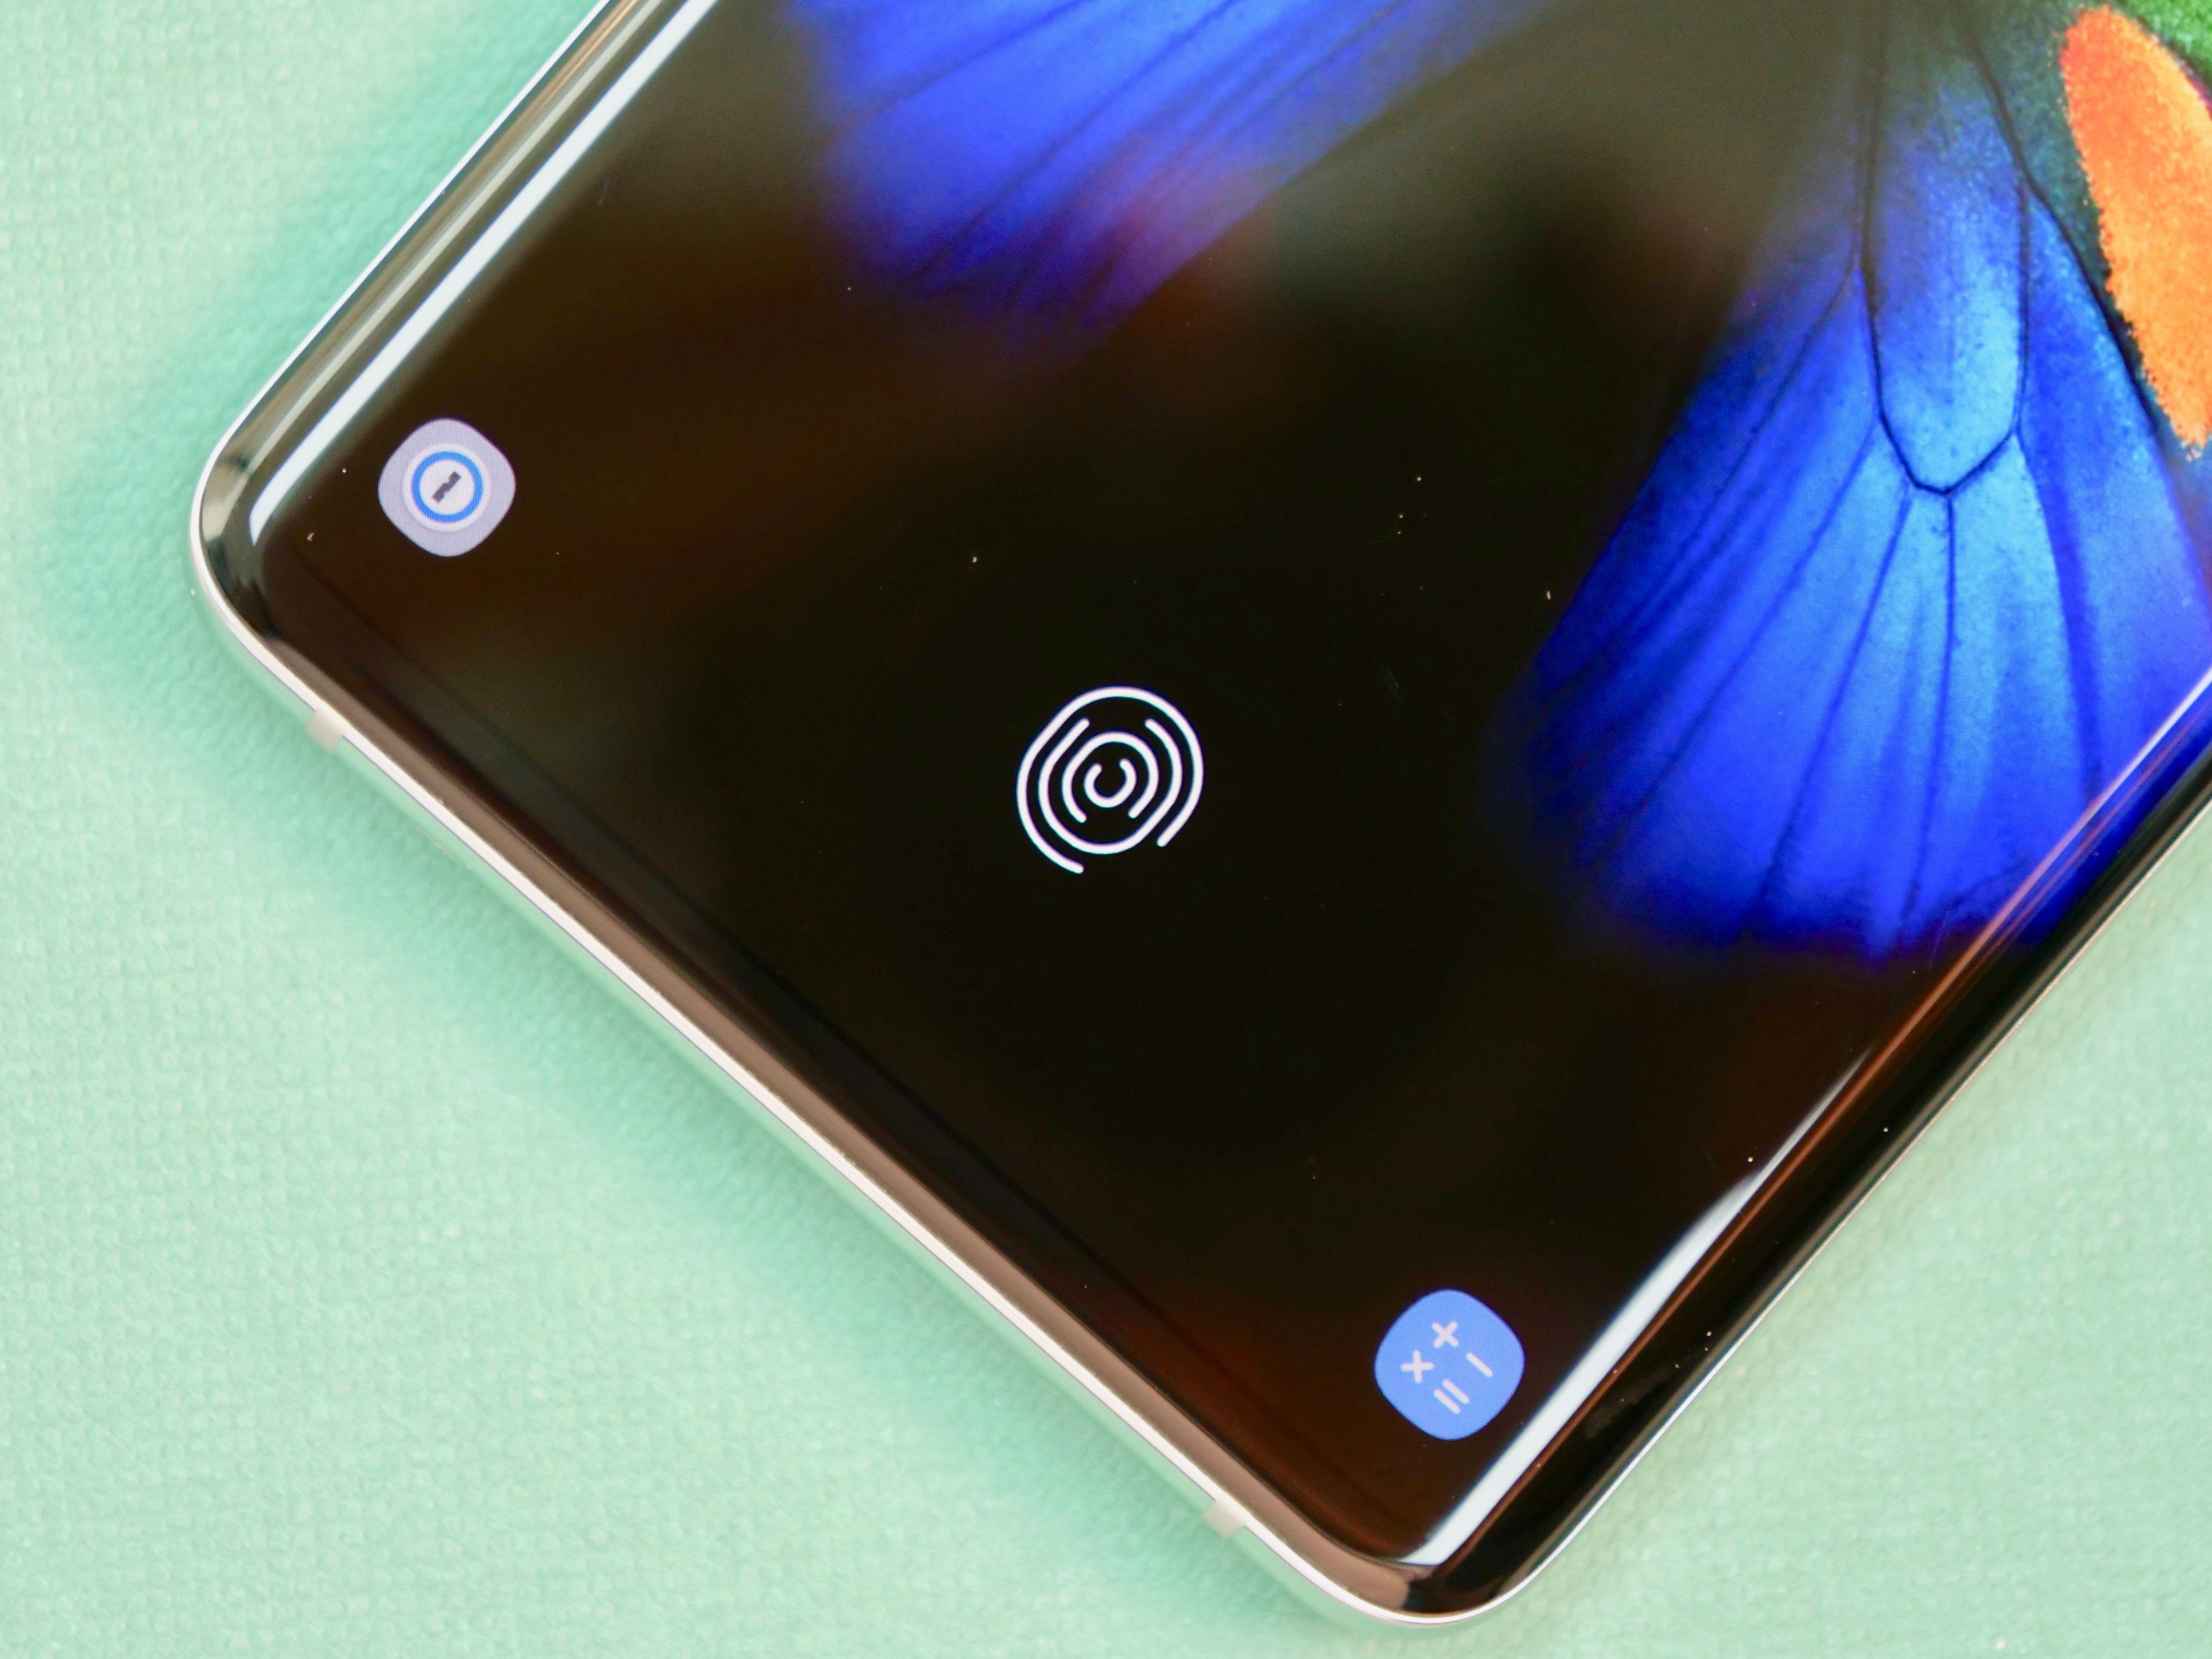 Samsung Galaxy S10+ 3D Sonic Fingerprint Reader